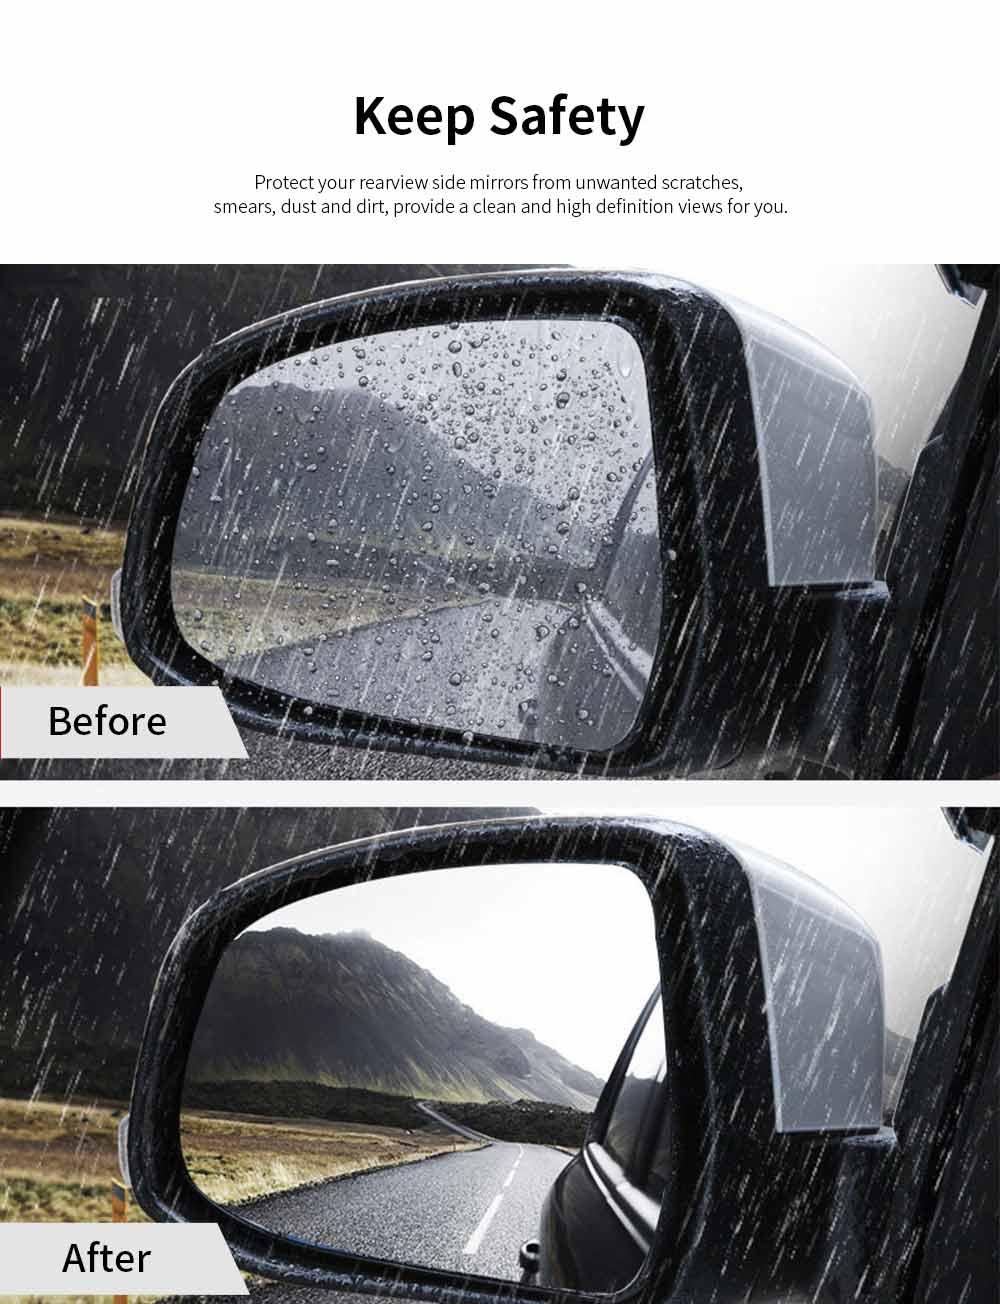 Car Rearview Mirror Film Anti-Fog Anti-Glare Anti-Scratch HD Car Window Membrane Rainproof Clear Protective Films For Honda XRV CRV AVANCIER URV Accord Odyssey City Fit Saloon GREIZ 1